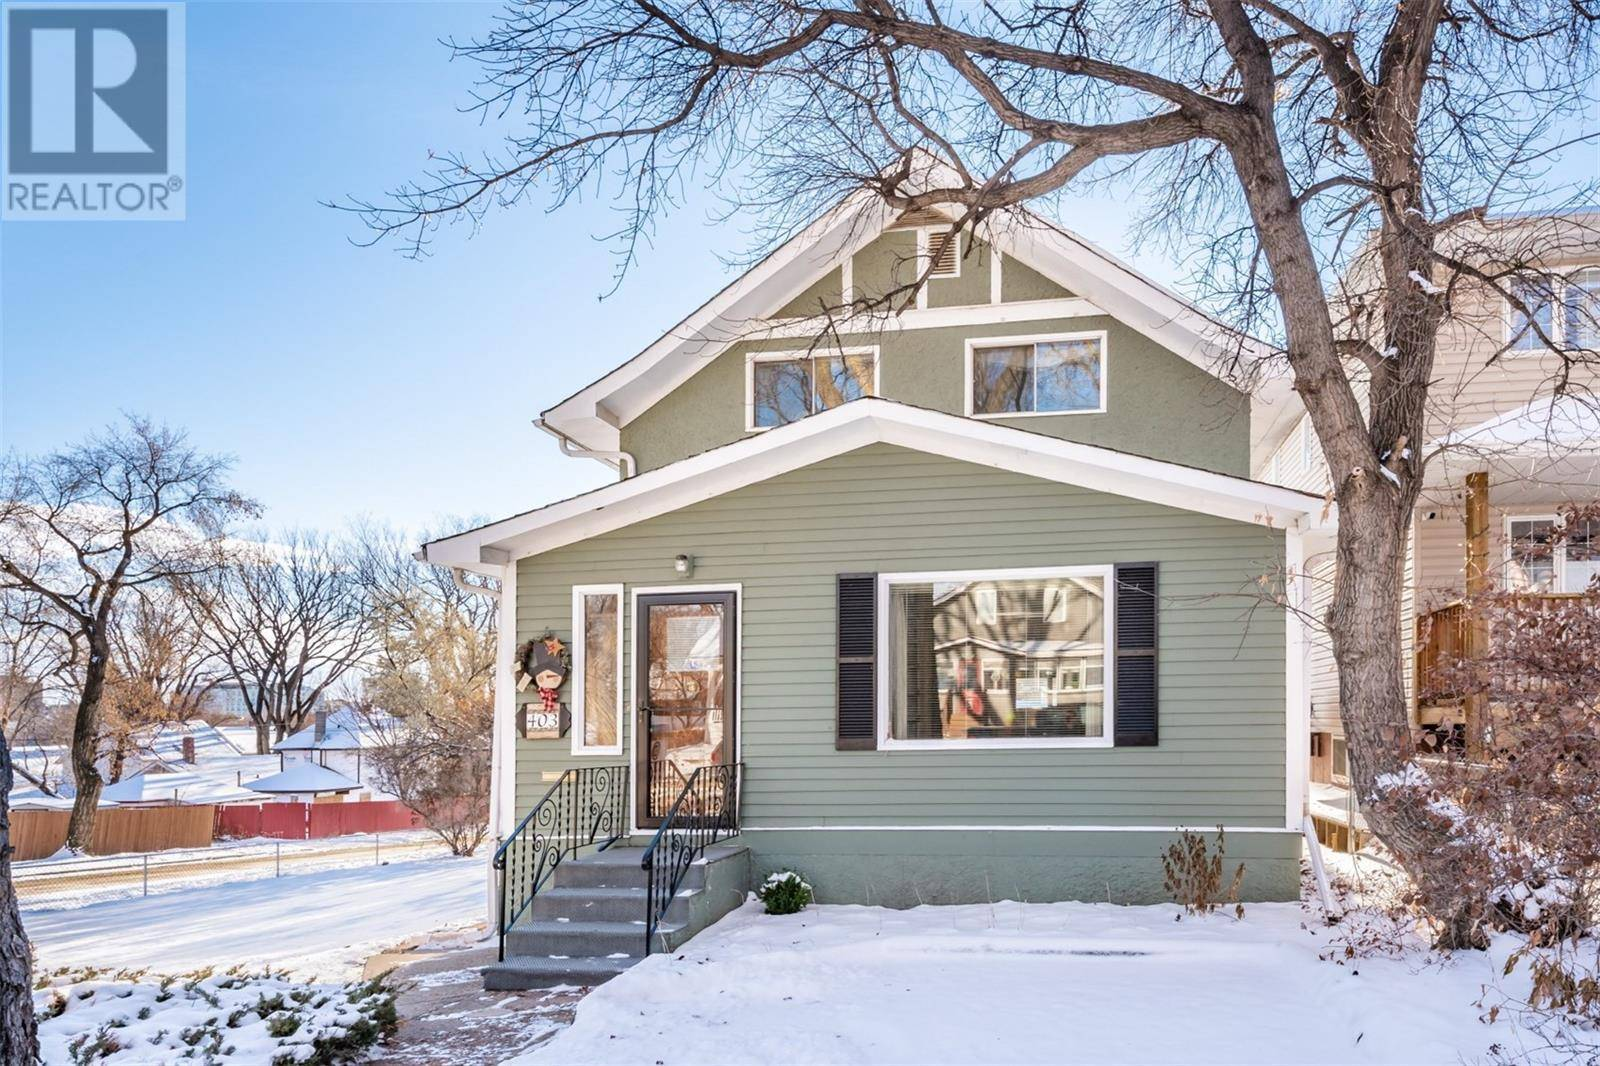 House for sale at 403 26th St W Saskatoon Saskatchewan - MLS: SK793773